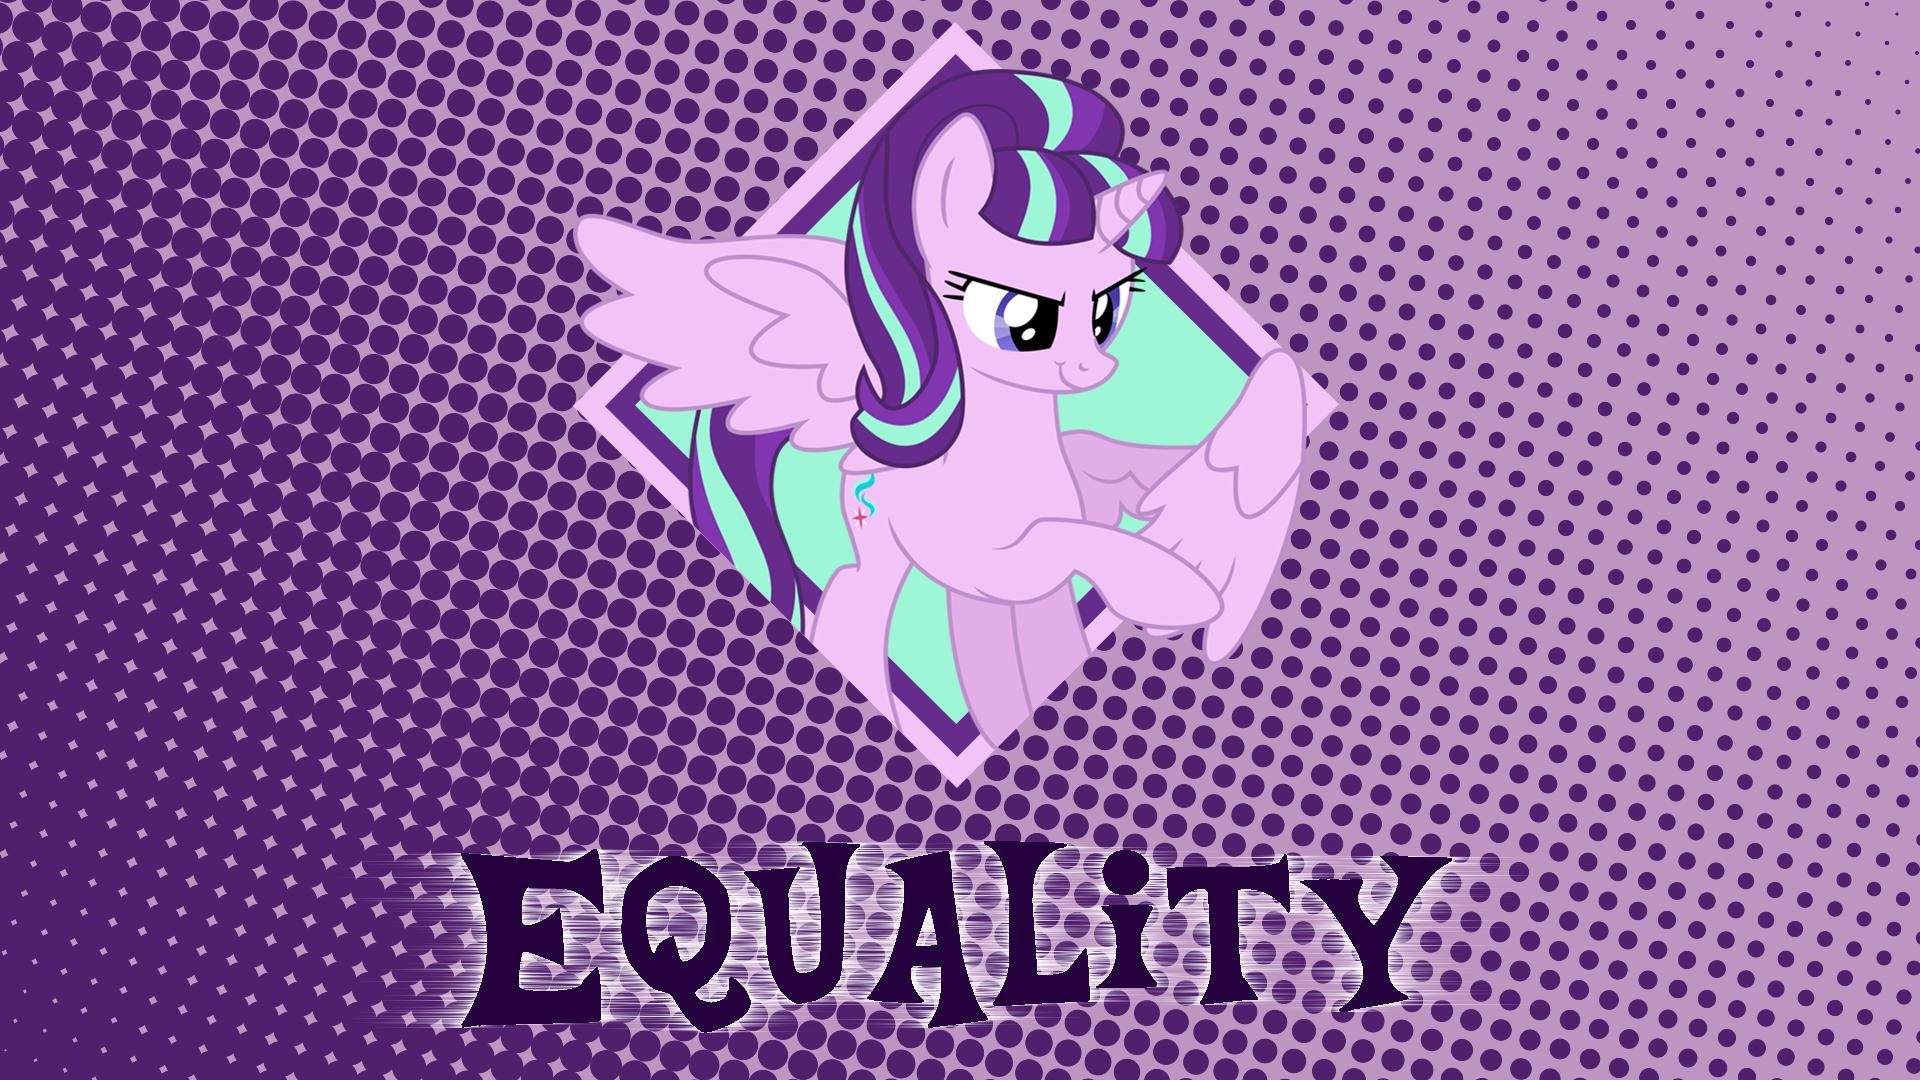 [WOTW #1] Princess of Equality